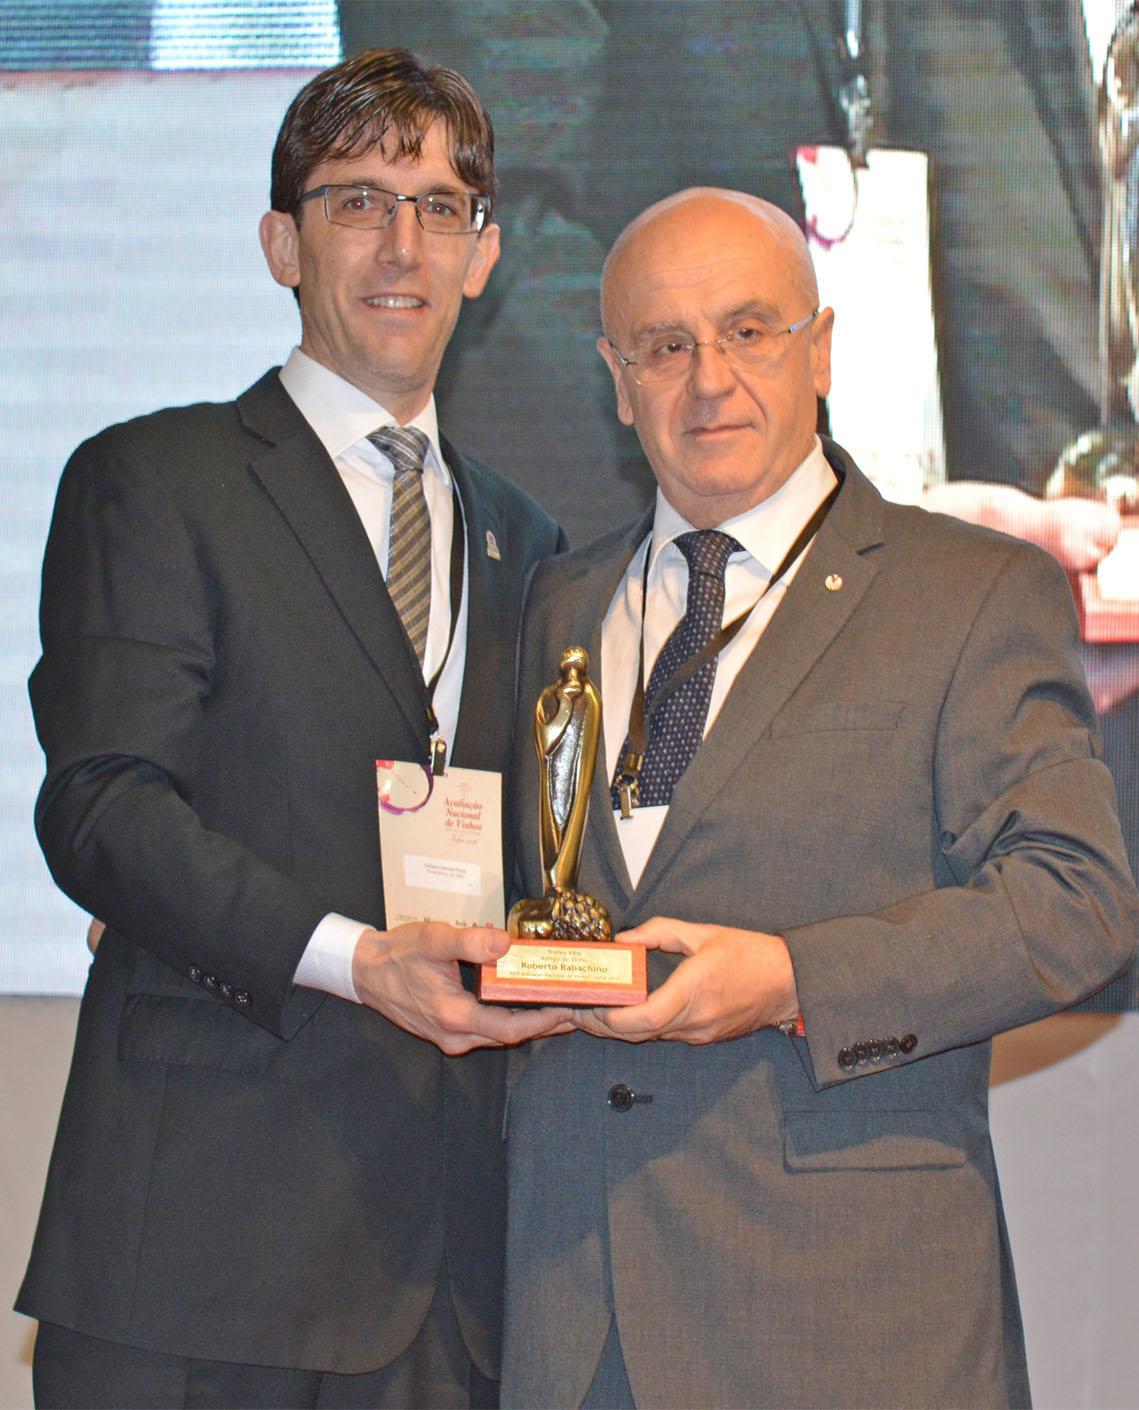 Troféu Vitis Amigo do Vinho 2016 Rabachino Roberto